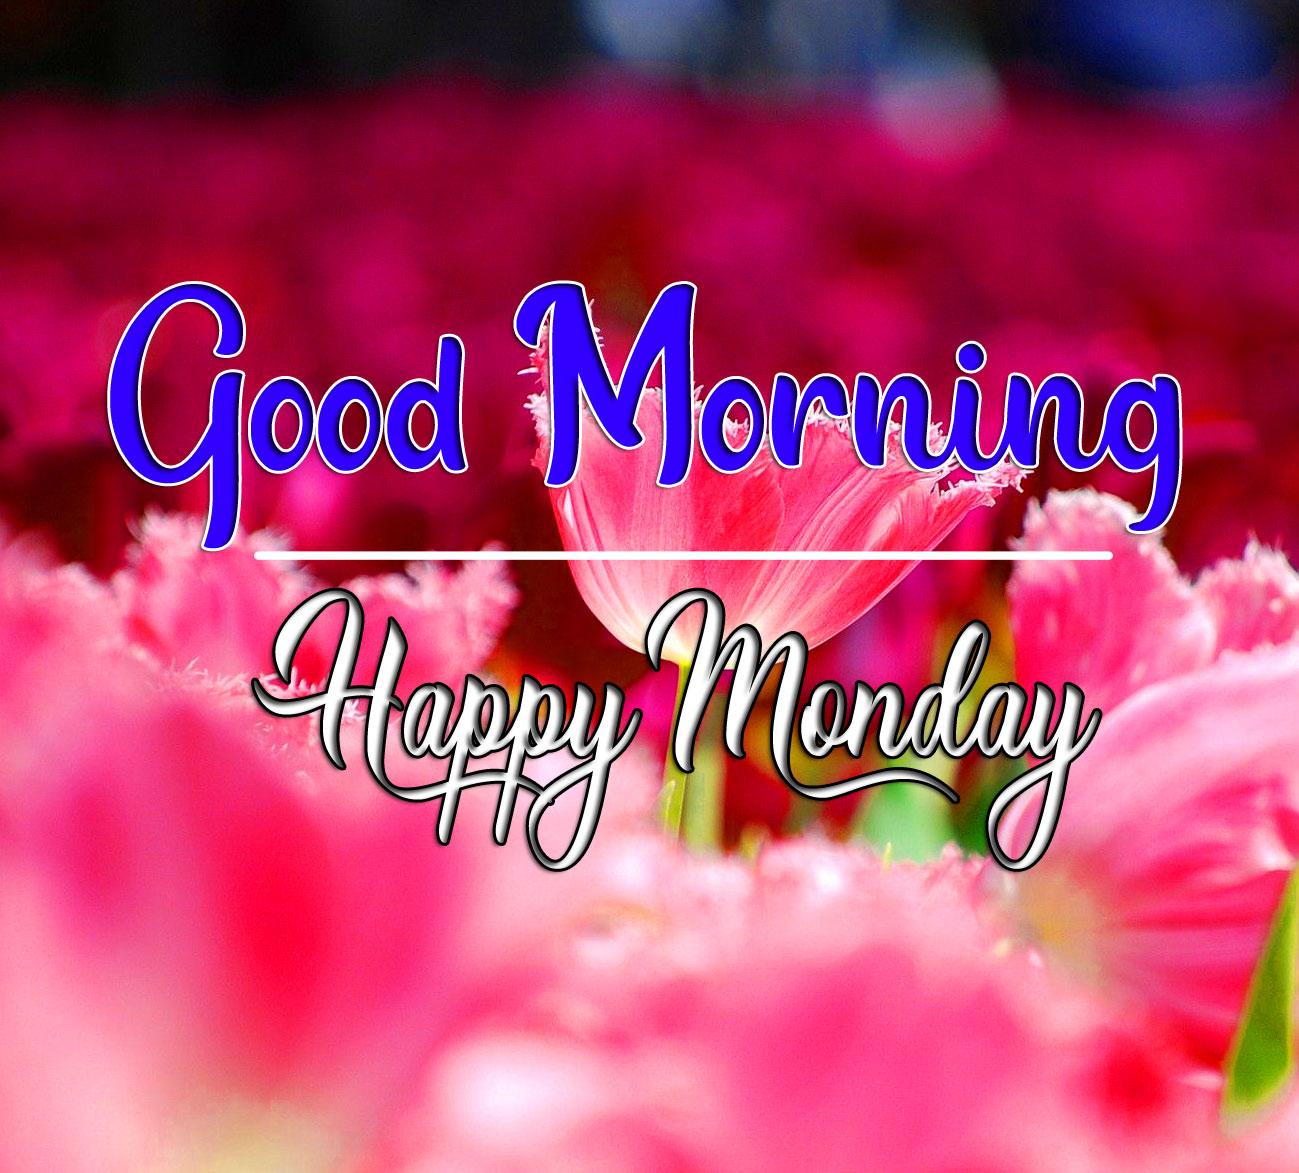 Monday Good Morning Wallpaper HD Download